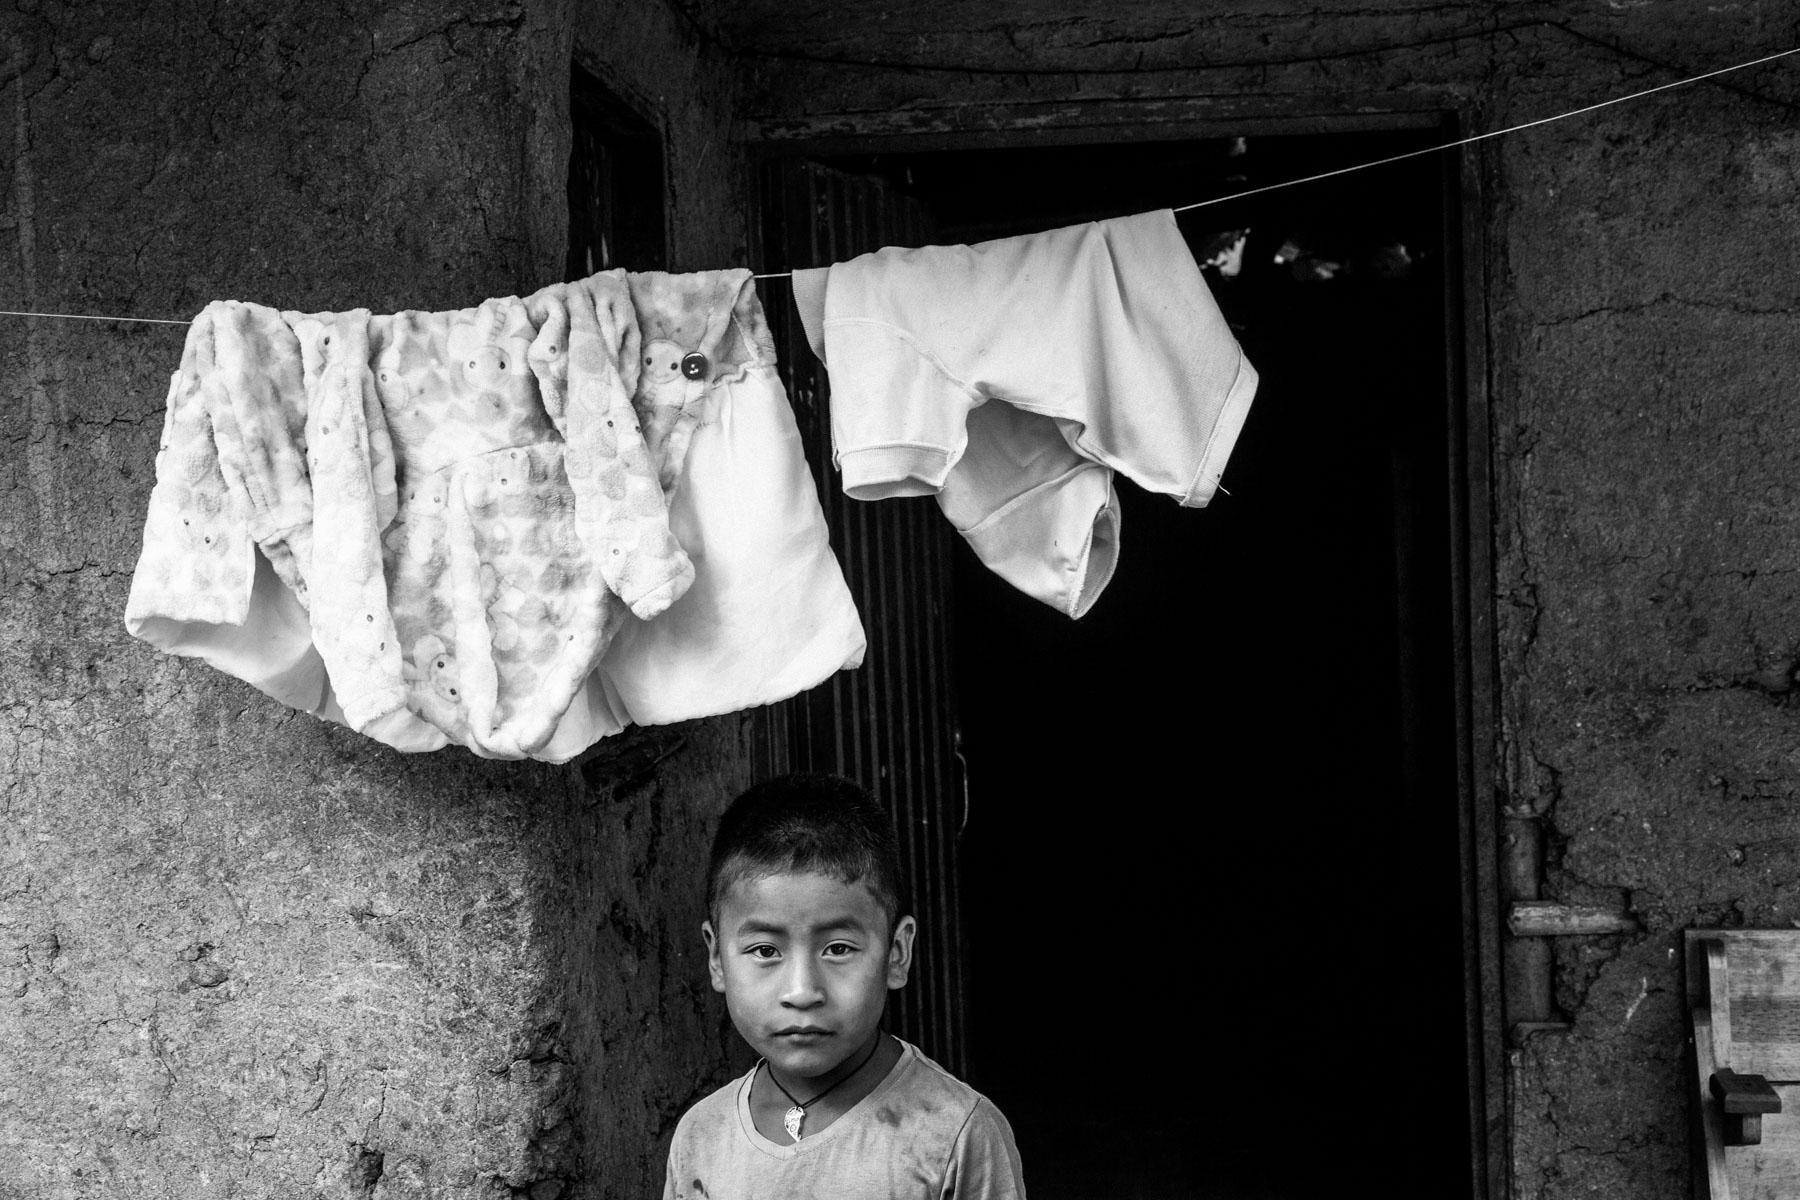 Marlon Santiago Pavi Ul (7 años), La Mina, Toribío, Cauca, Colombia, Agosto 18, 2018.